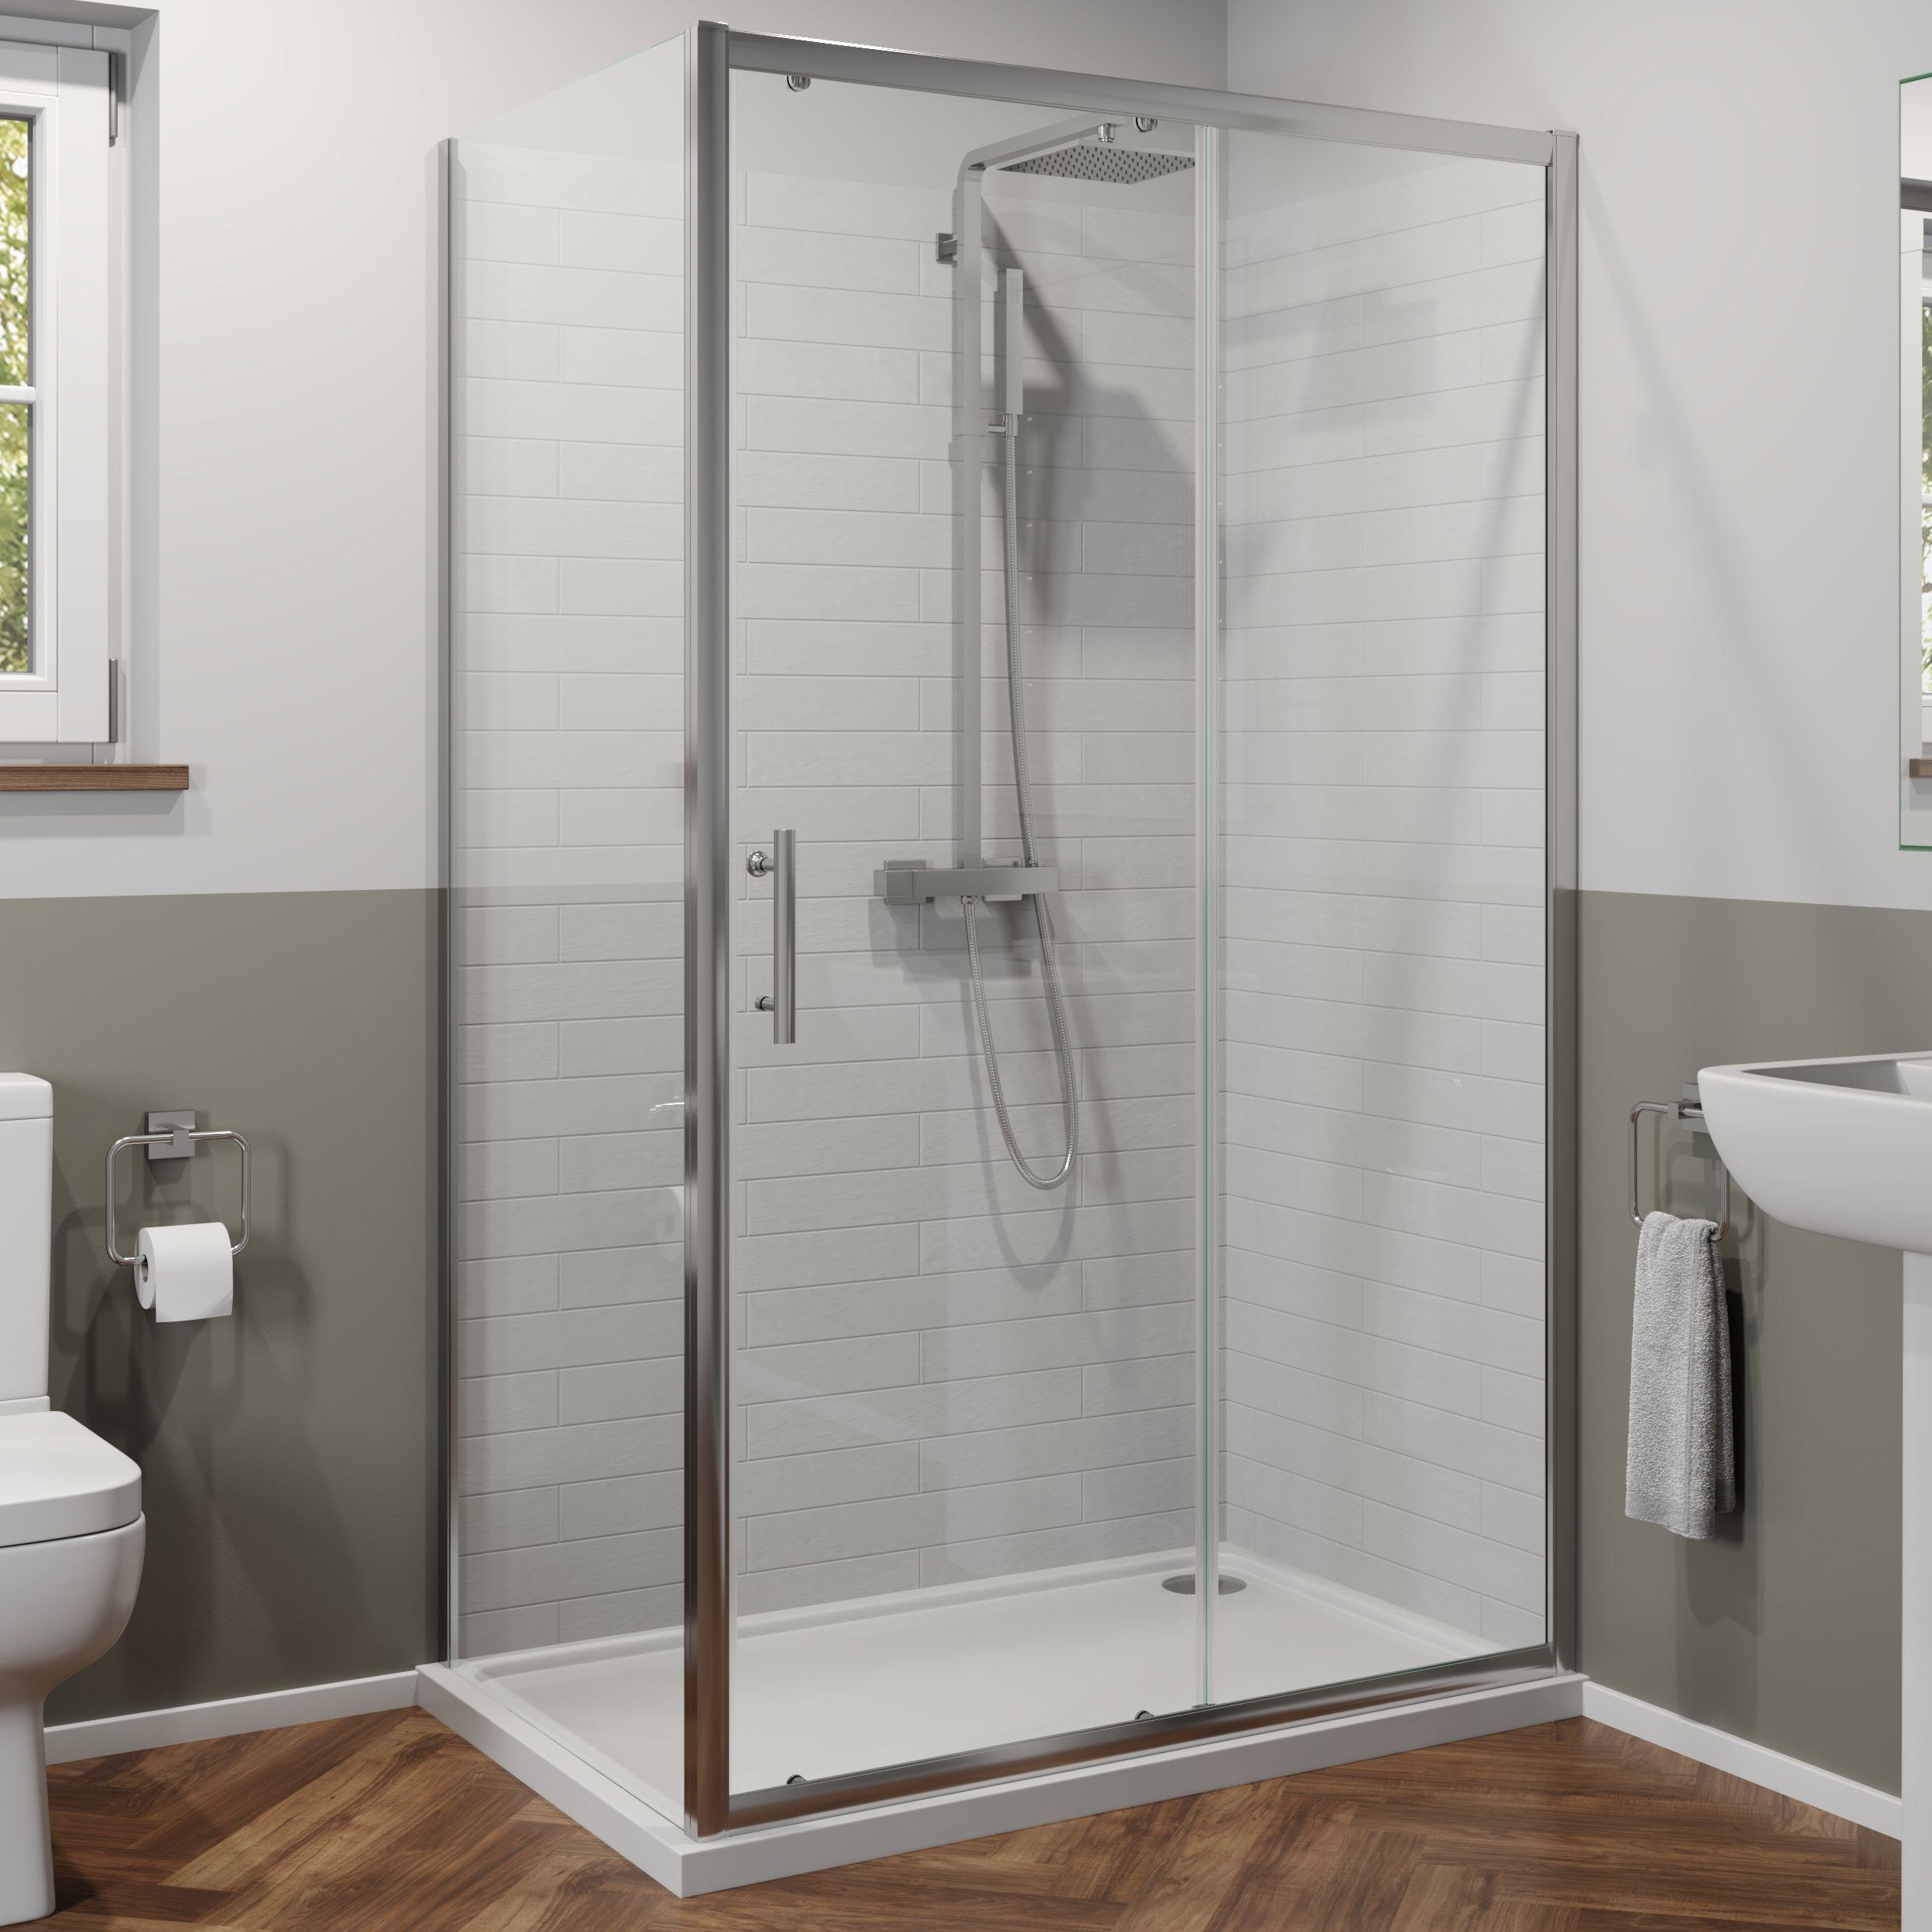 Luxura 1400 X 700mm Sliding Shower Door Side Panel 6mm Glass